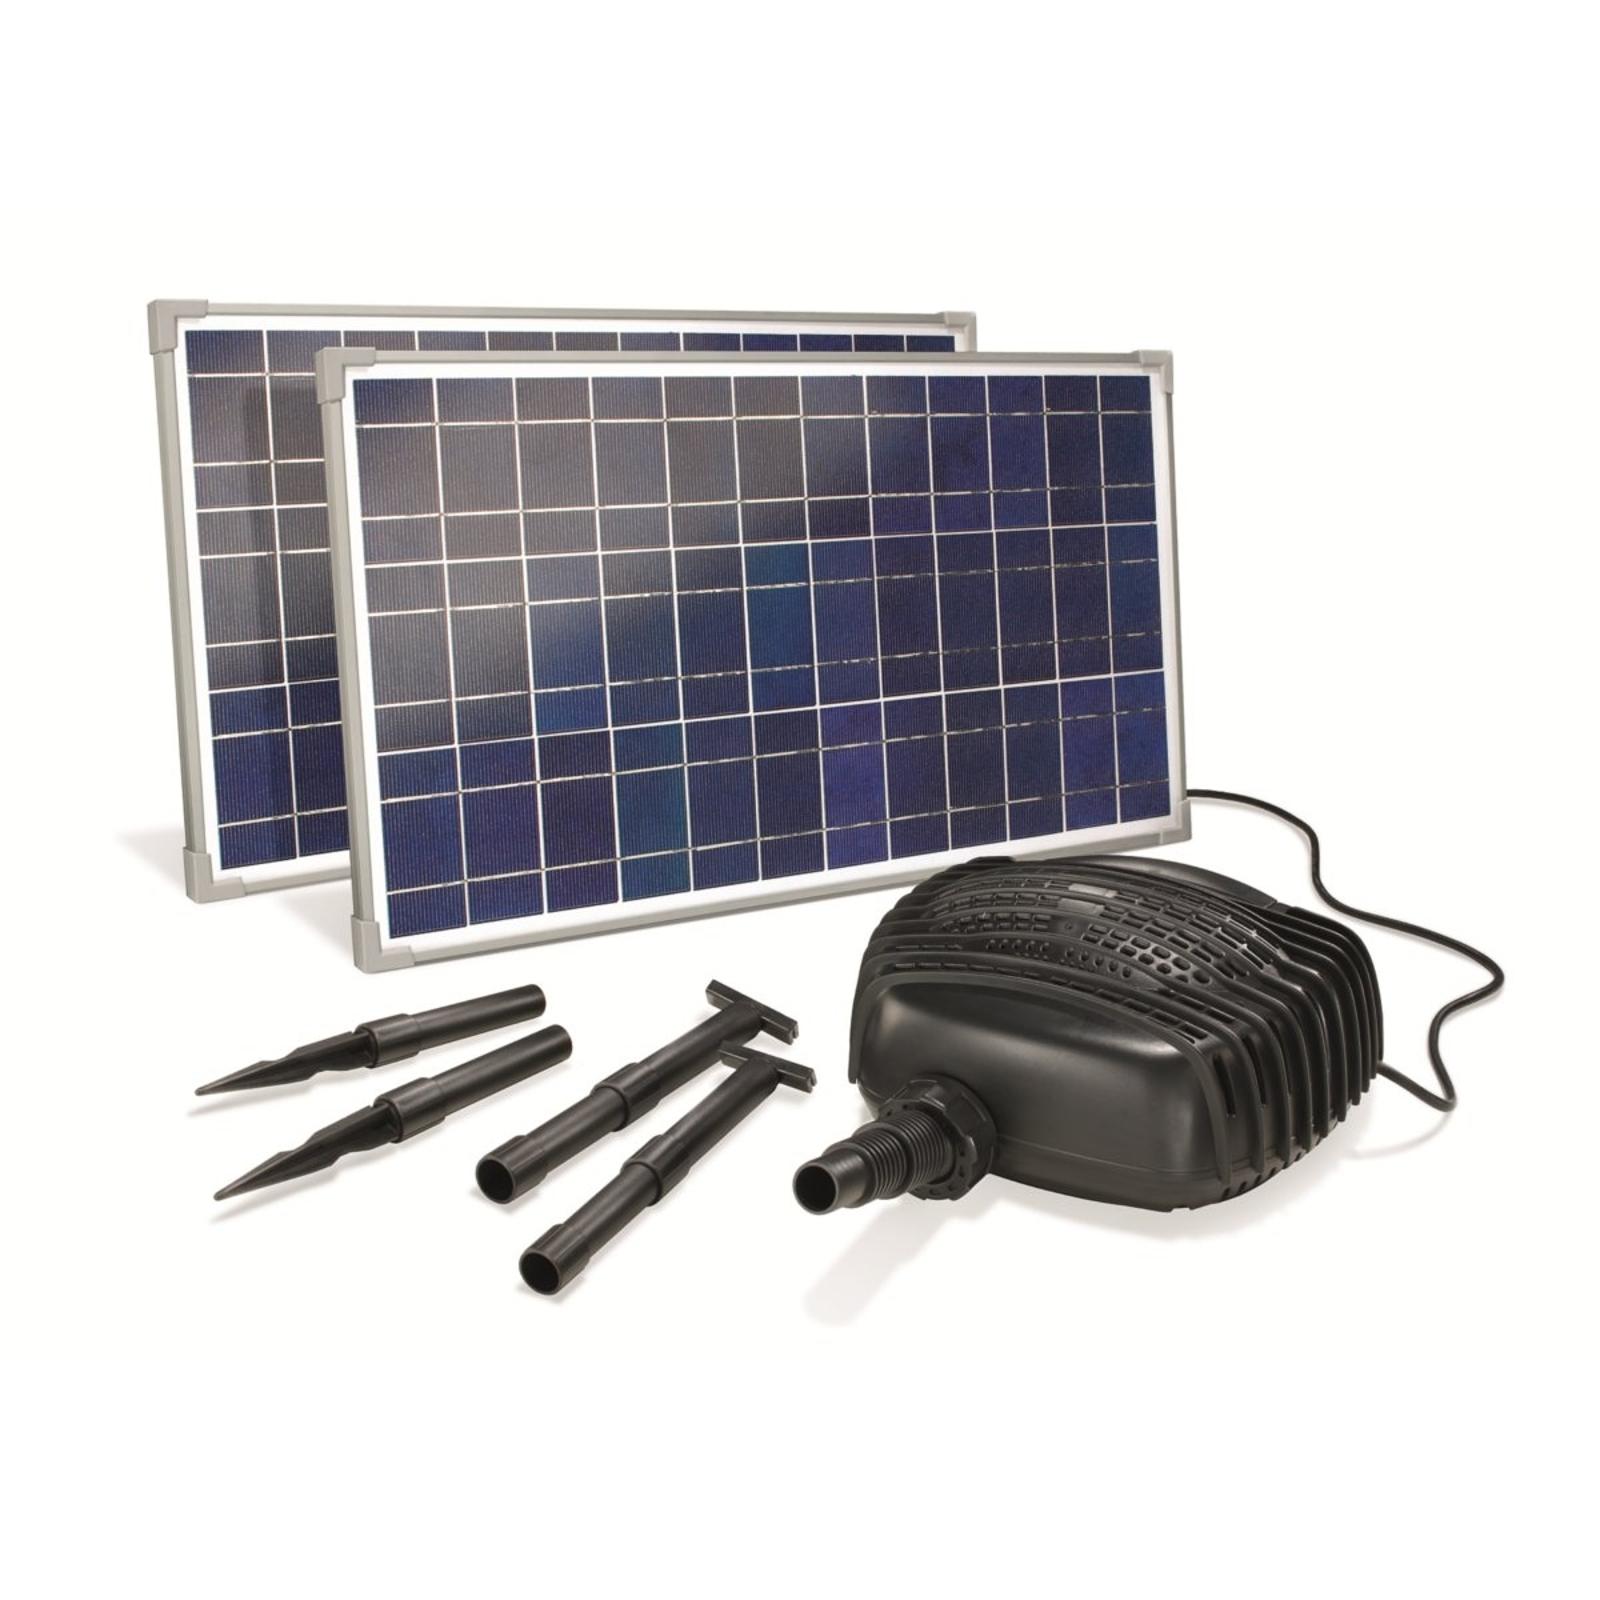 Adria solar stream pump system_3012196_1